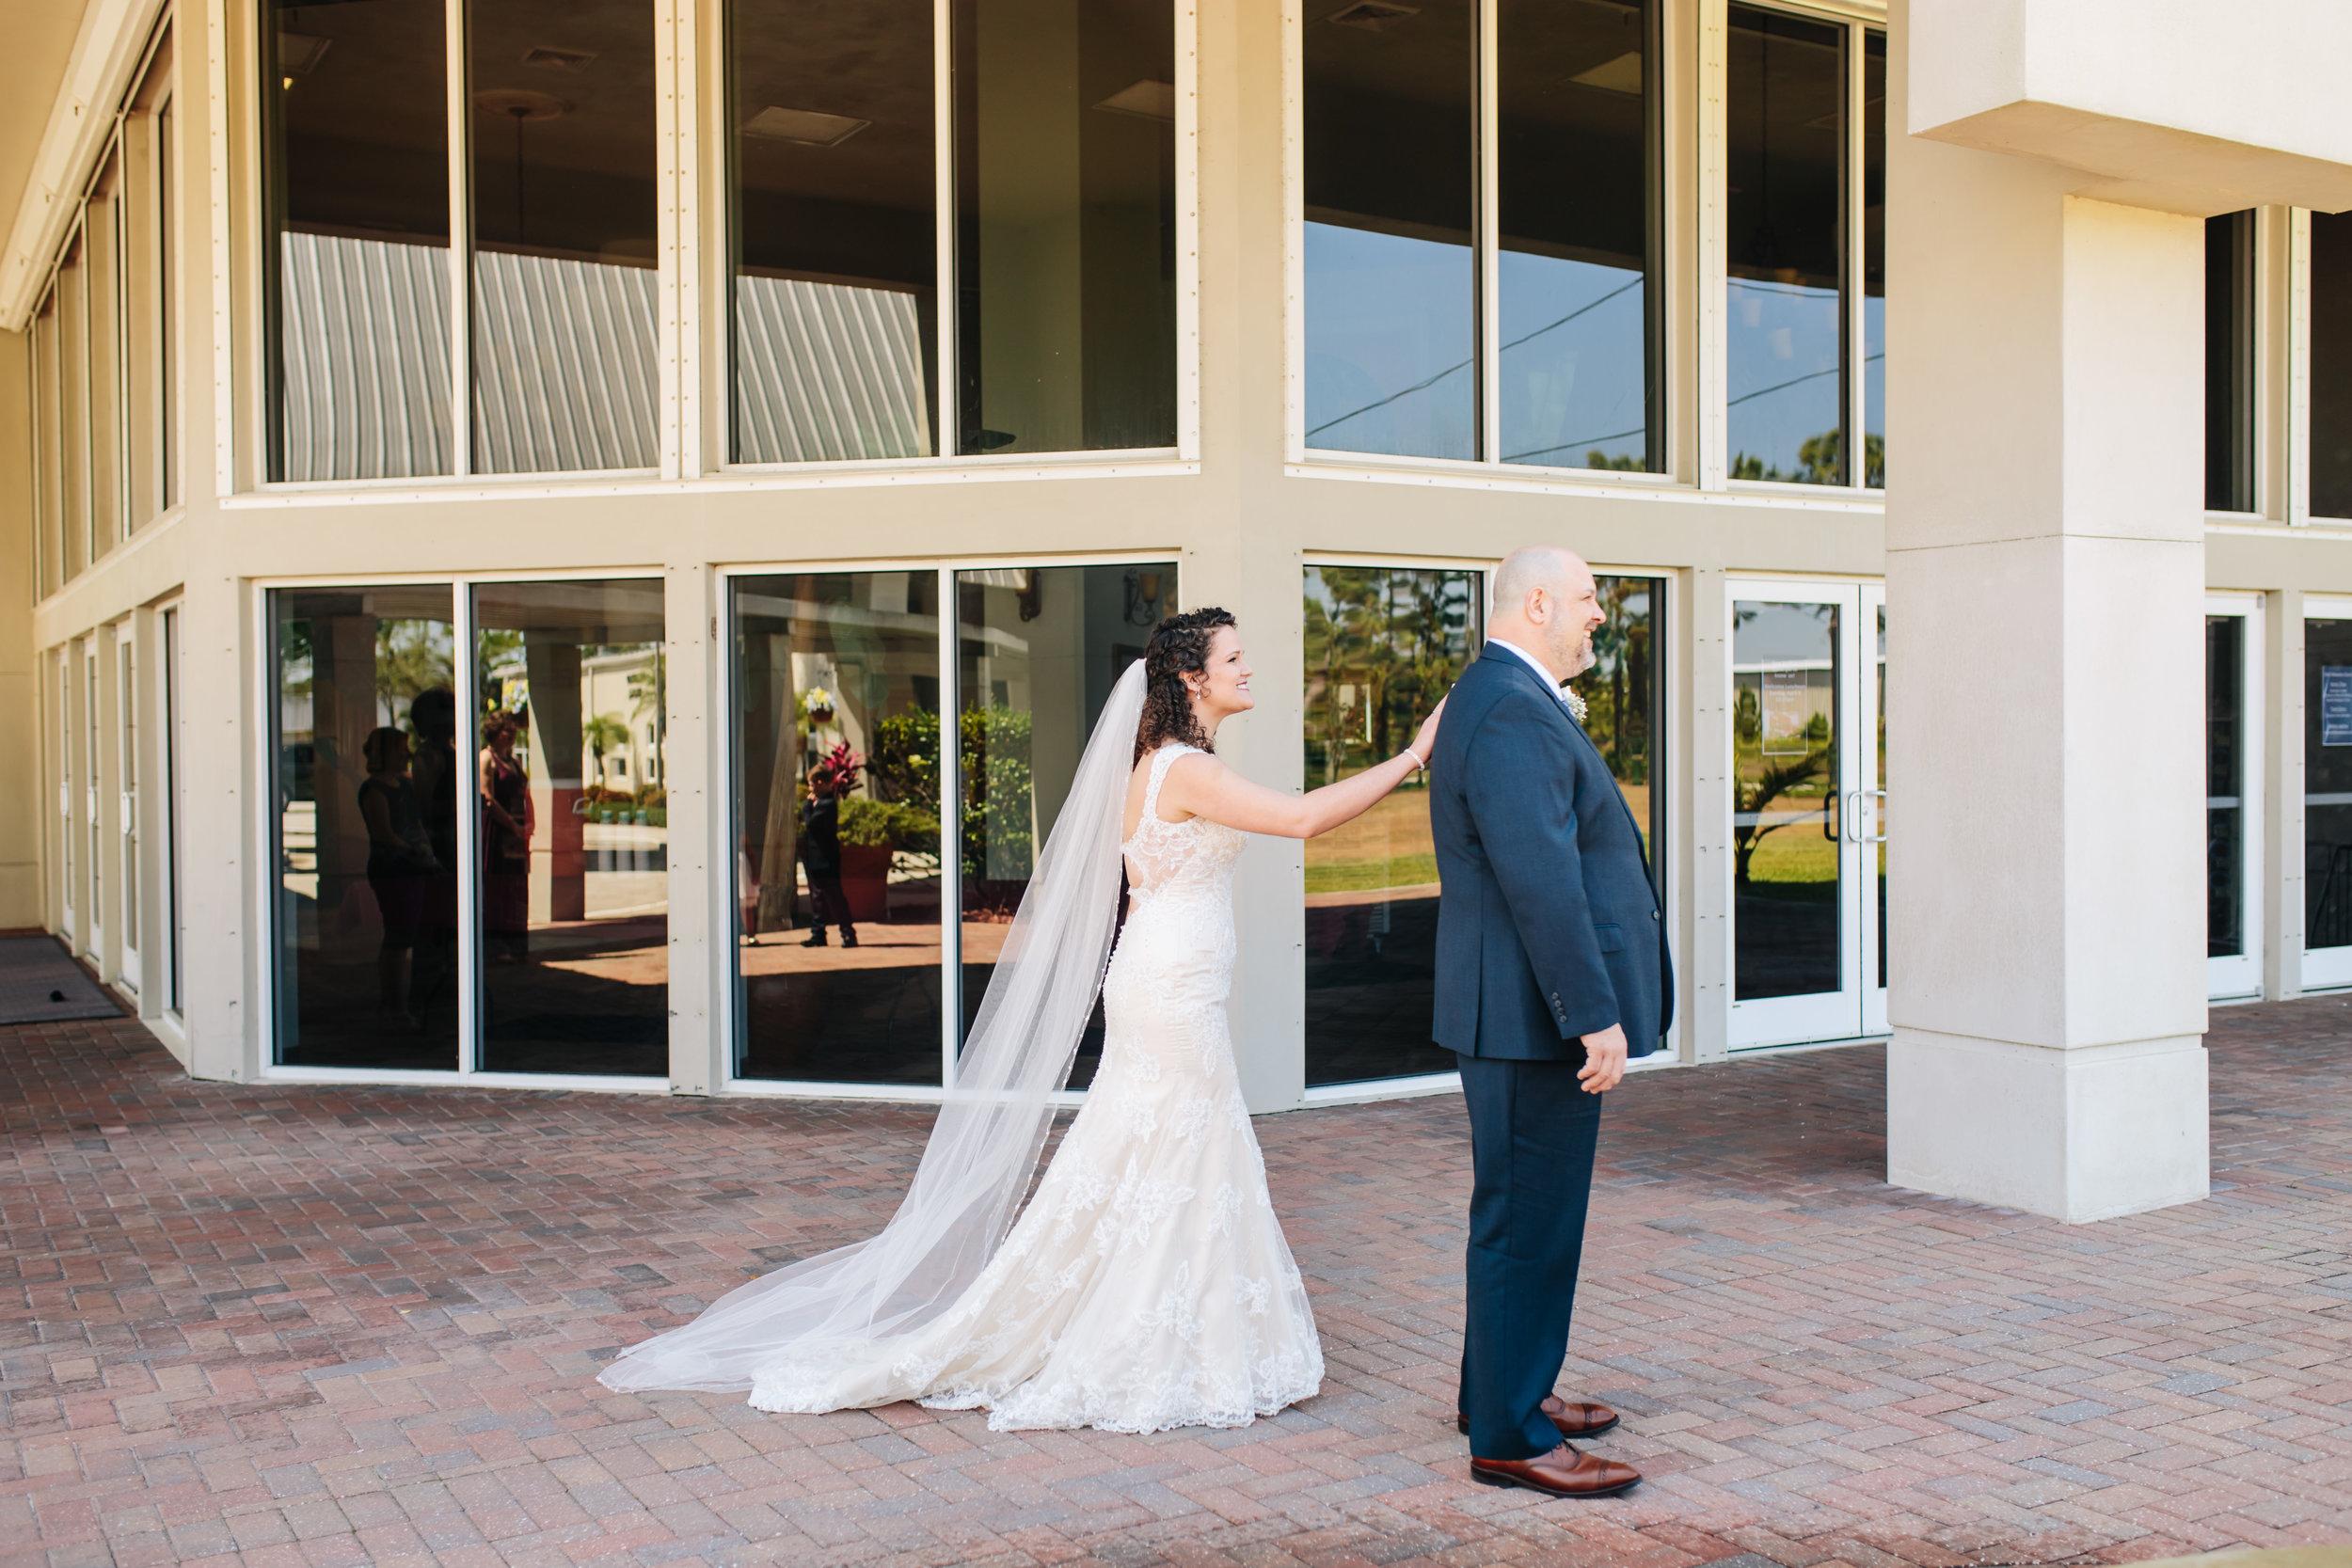 2018.03.17 Allison and Chuck Wedding Waelti Melbourne (79 of 900).jpg